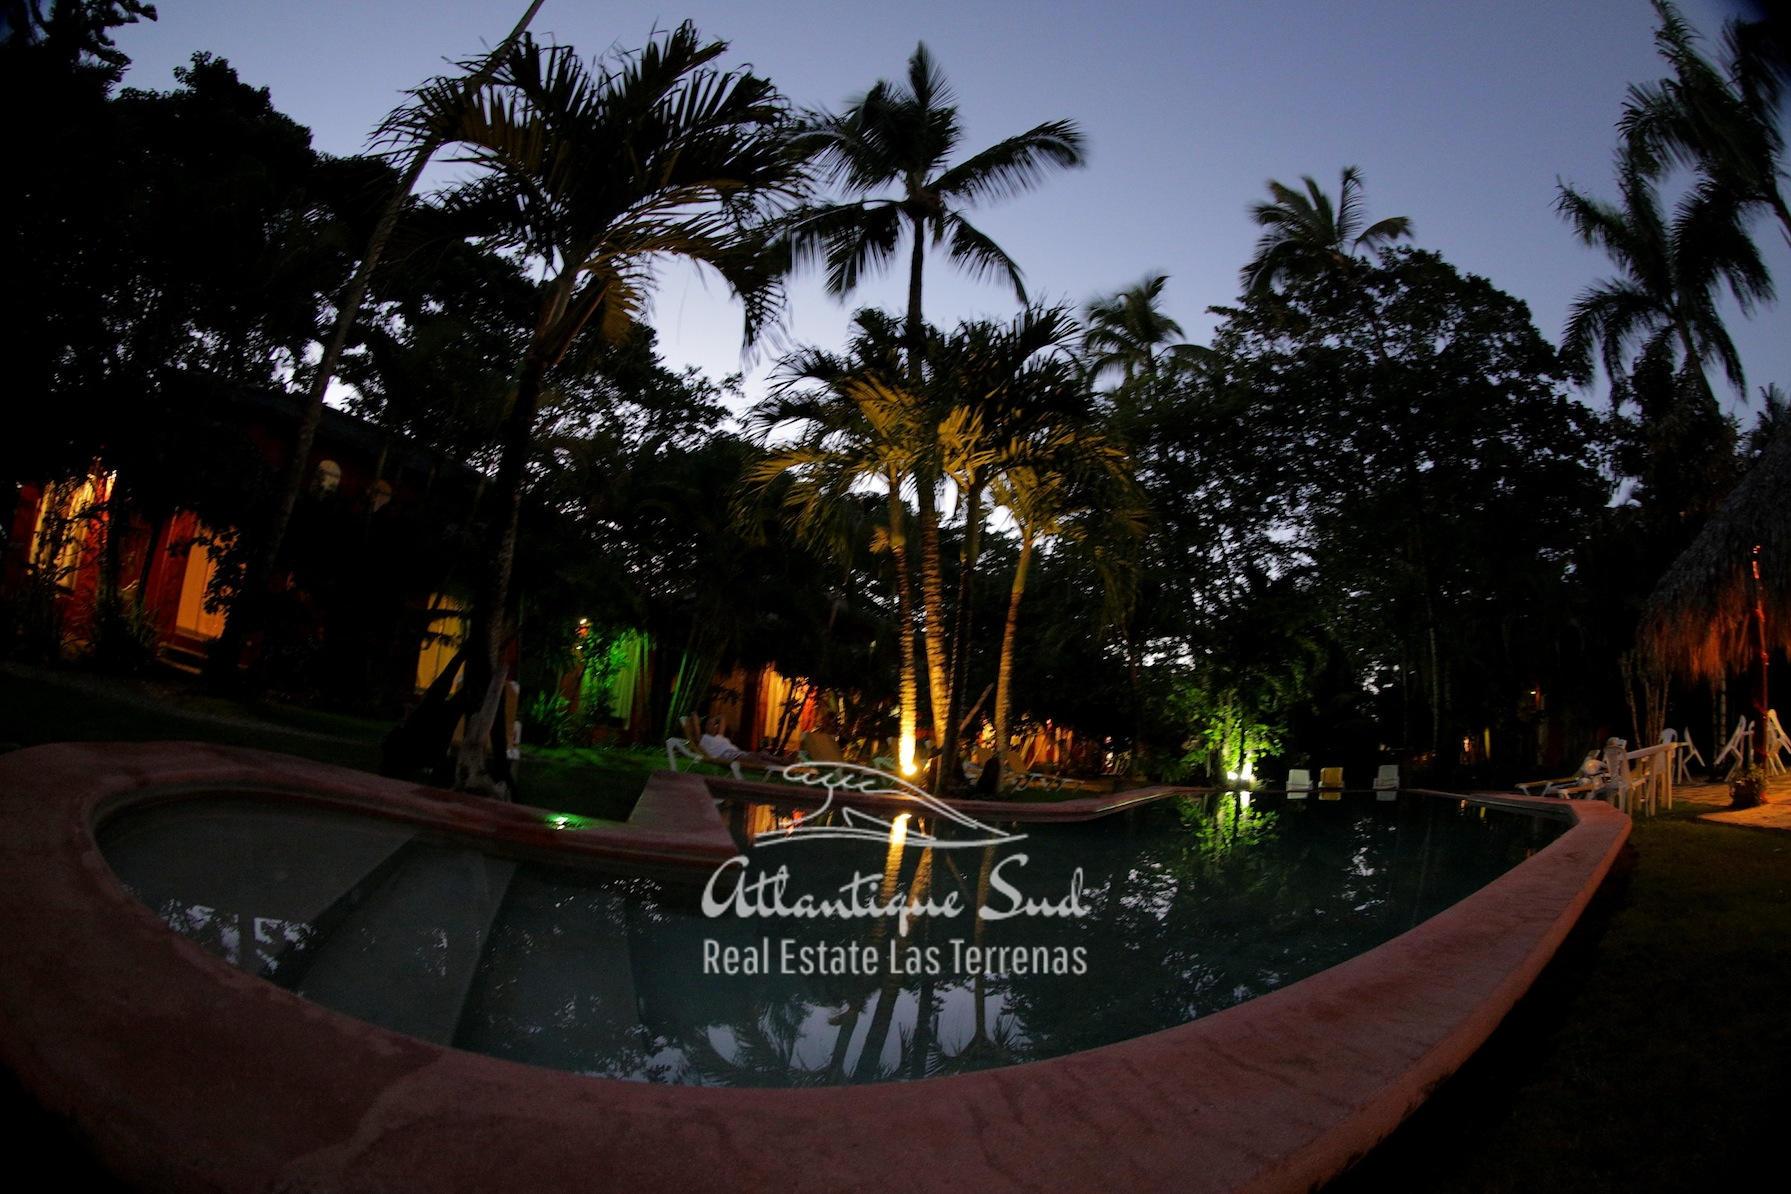 Colourful caribbean hotel in touristic heart Real Estate Las Terrenas Dominican Republic22.jpg